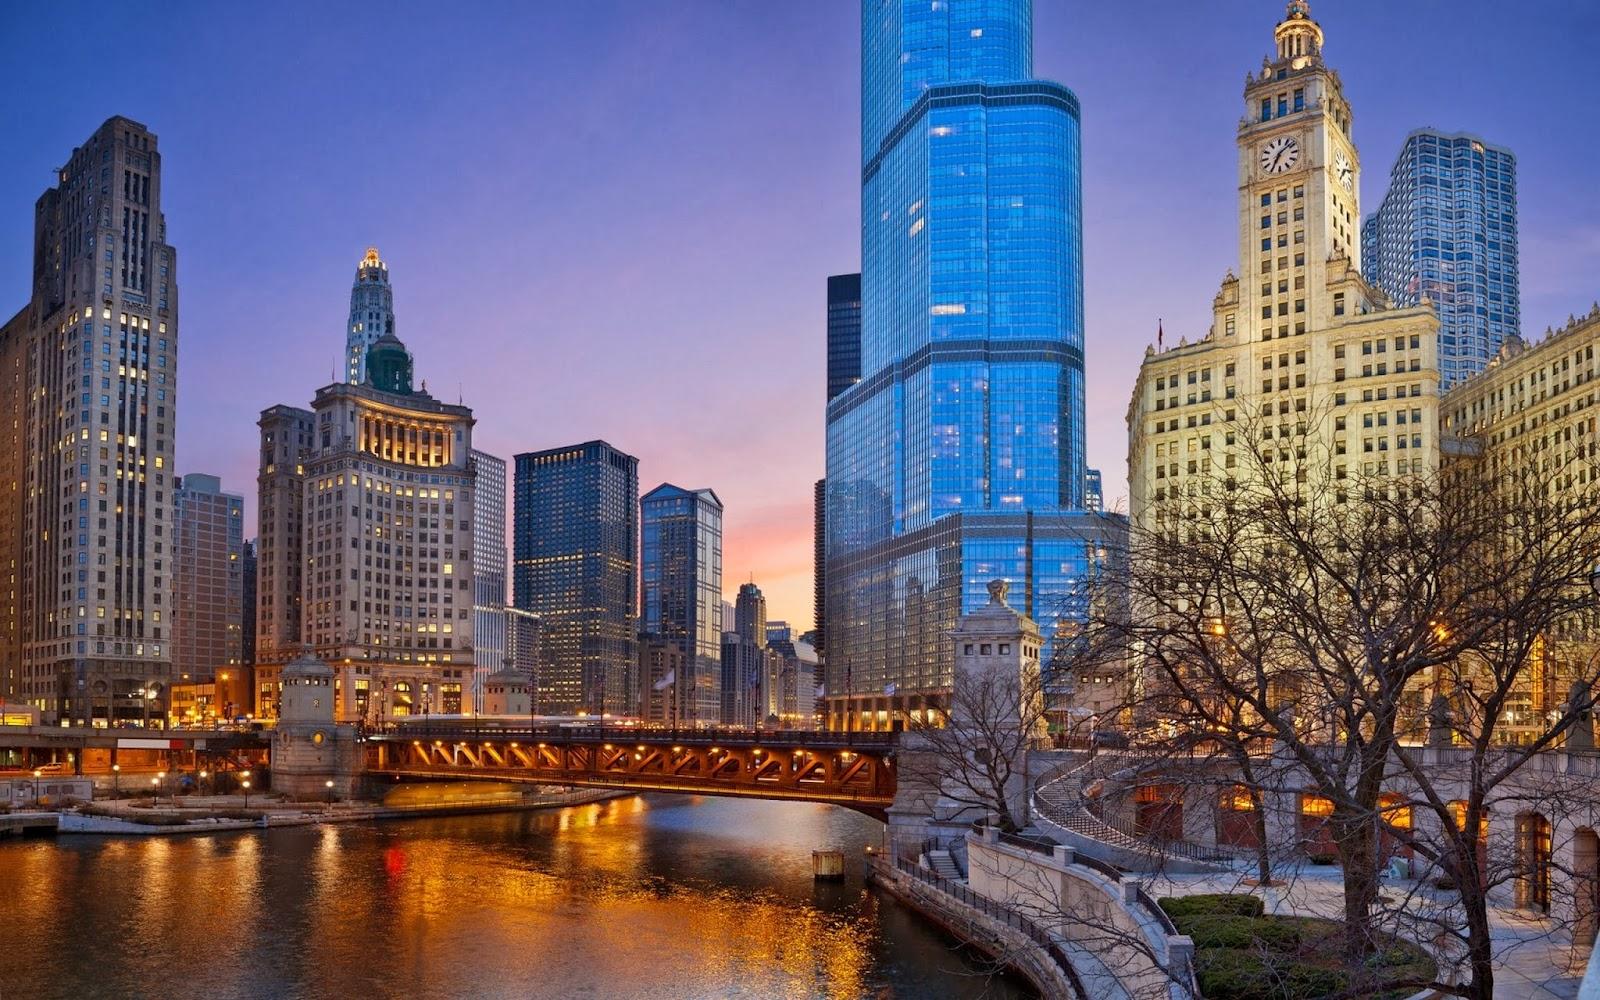 chicago-illinois-night